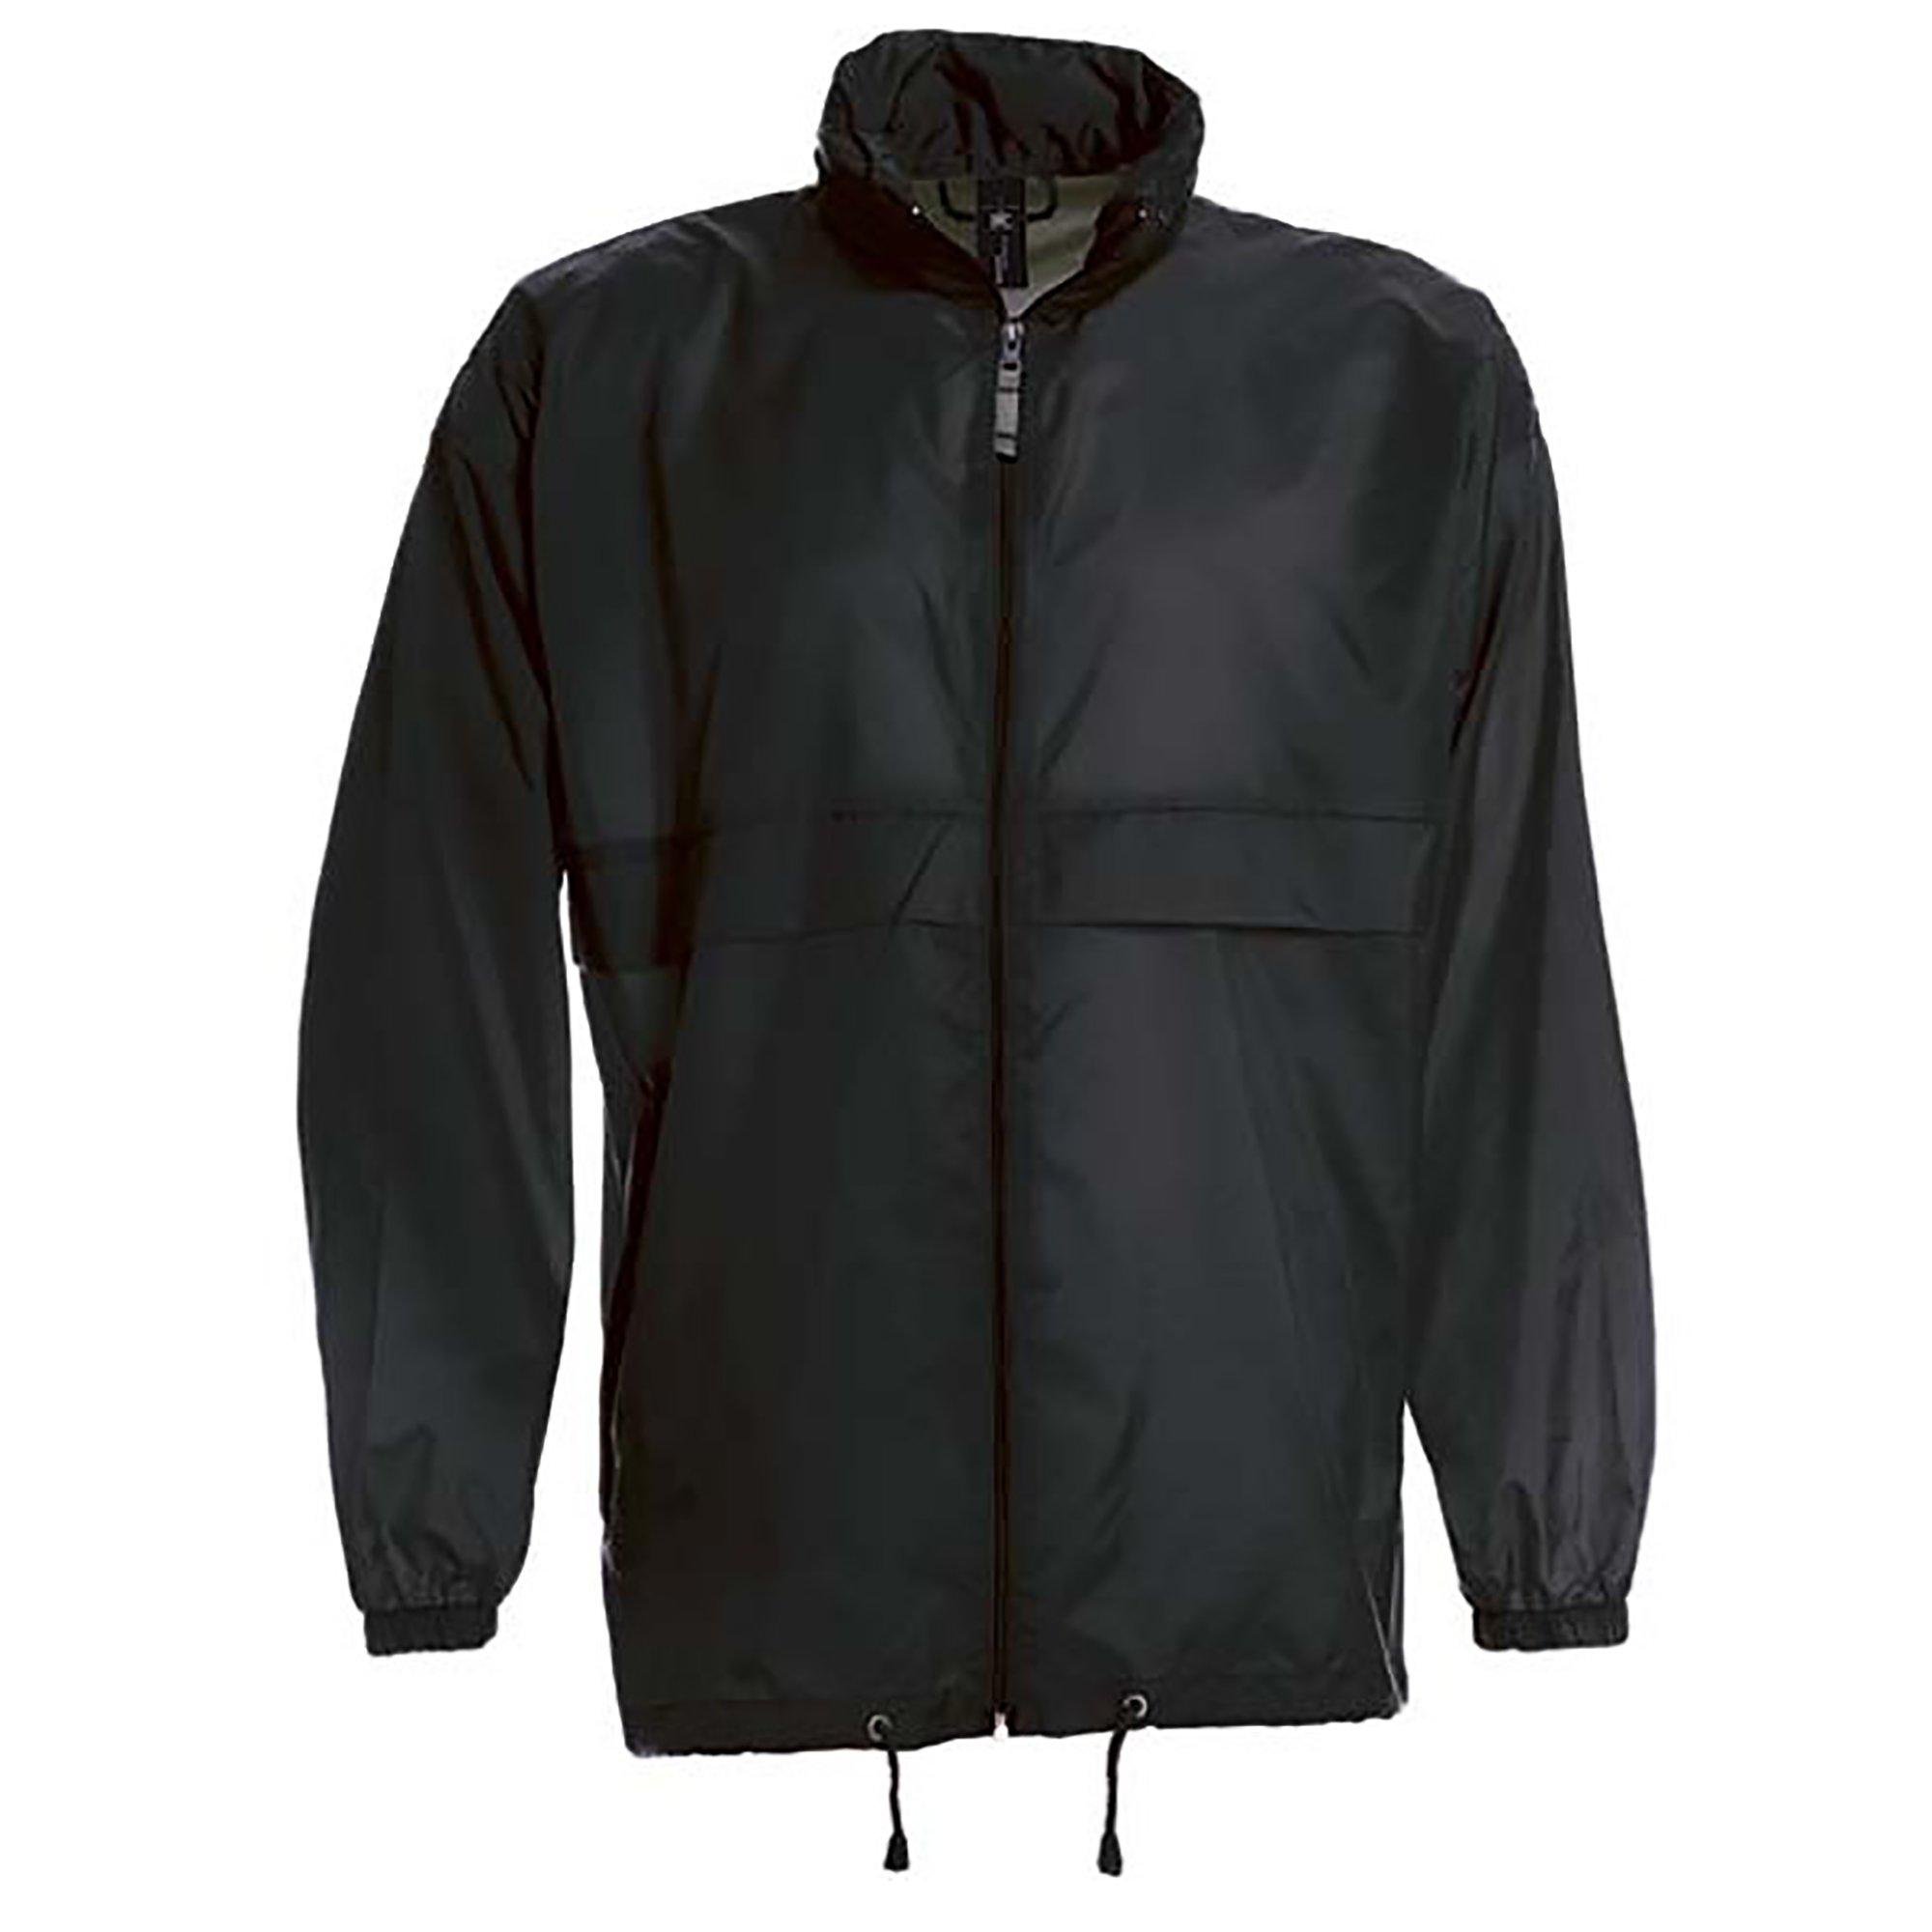 B&C Sirocco Mens Lightweight Jacket/Mens Outer Jackets (XL) (Black)